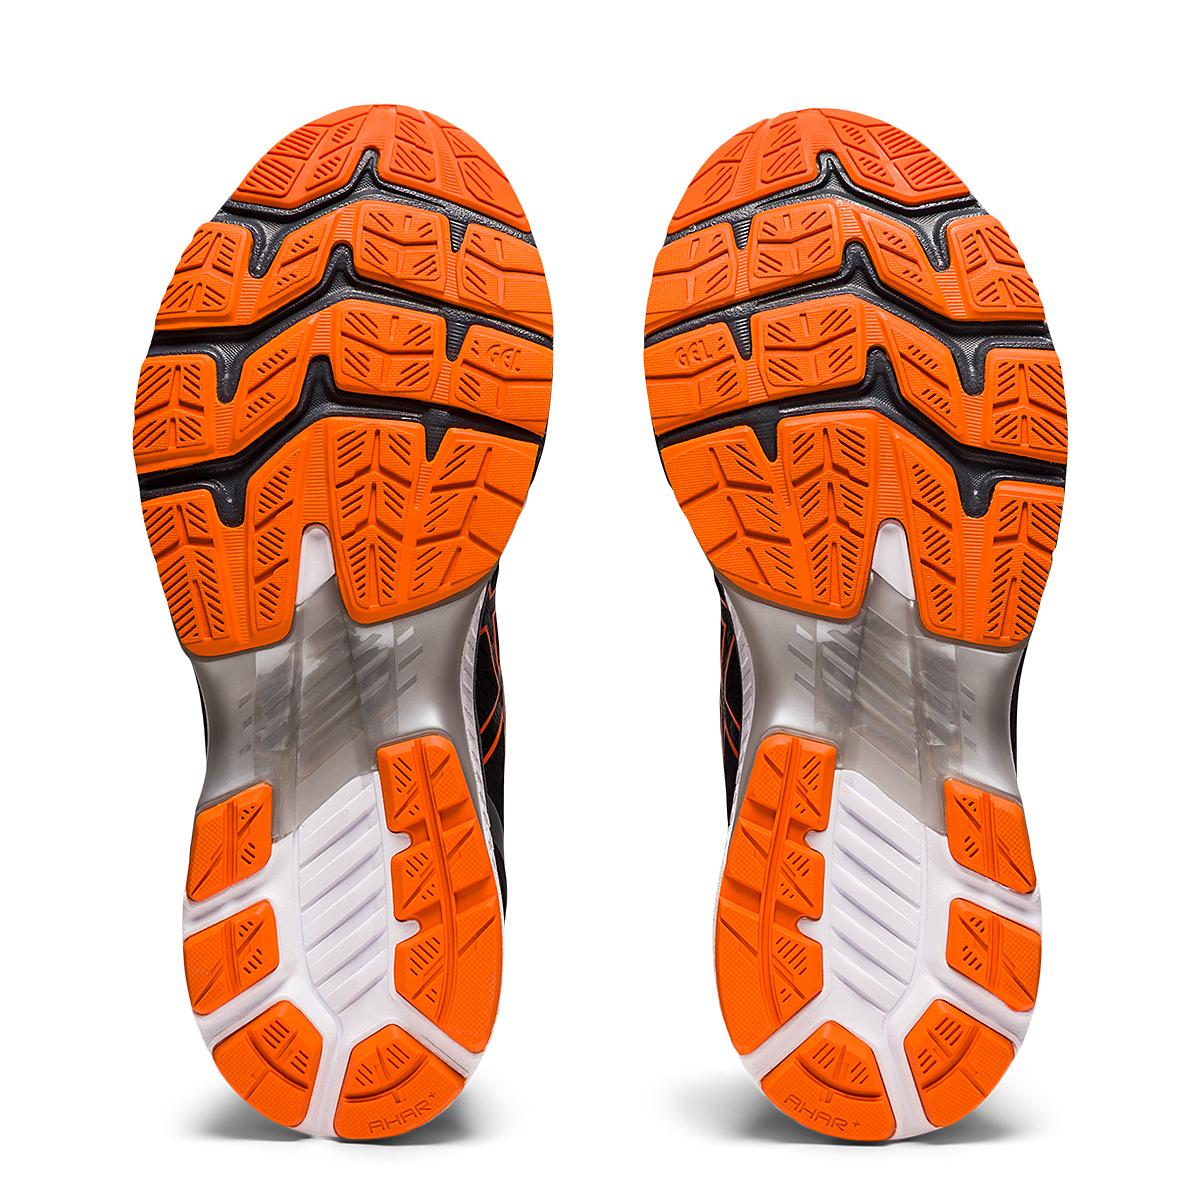 Men's Asics GEL-Kayano 27 Running Shoe - Color: Black/Marigold - Size: 7.5 - Width: Regular, Black/Marigold, large, image 7